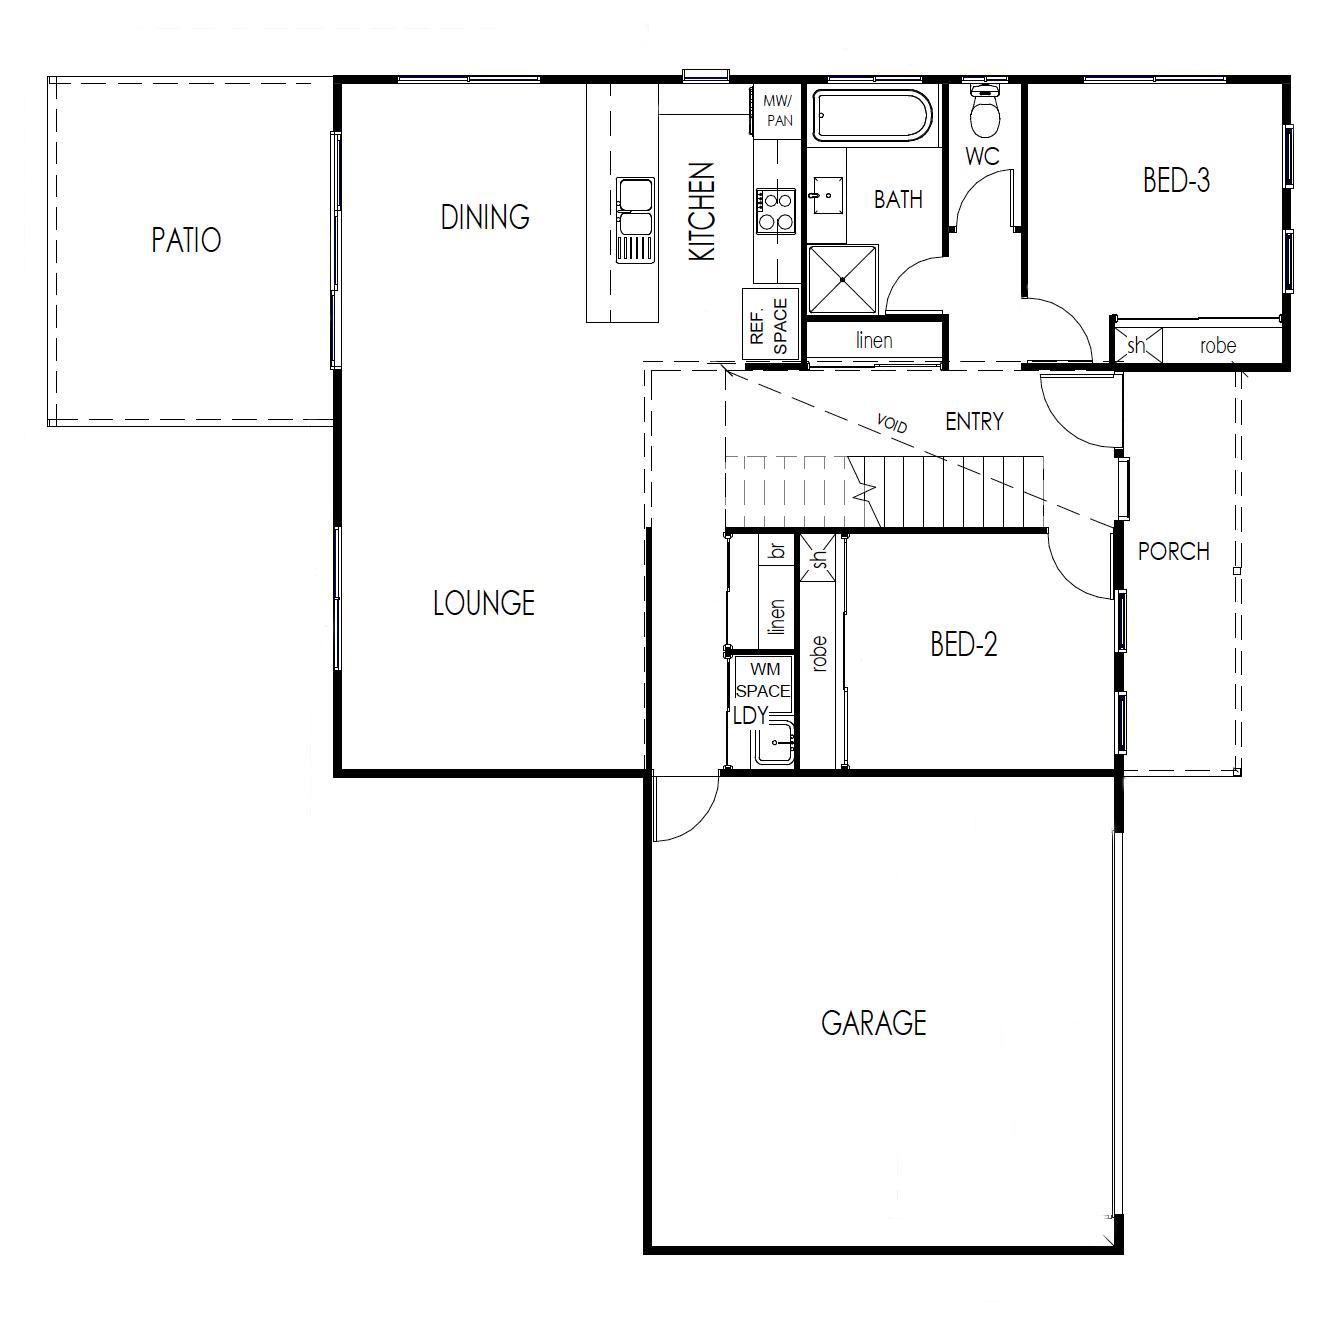 LR Highset Floorplan 2.png